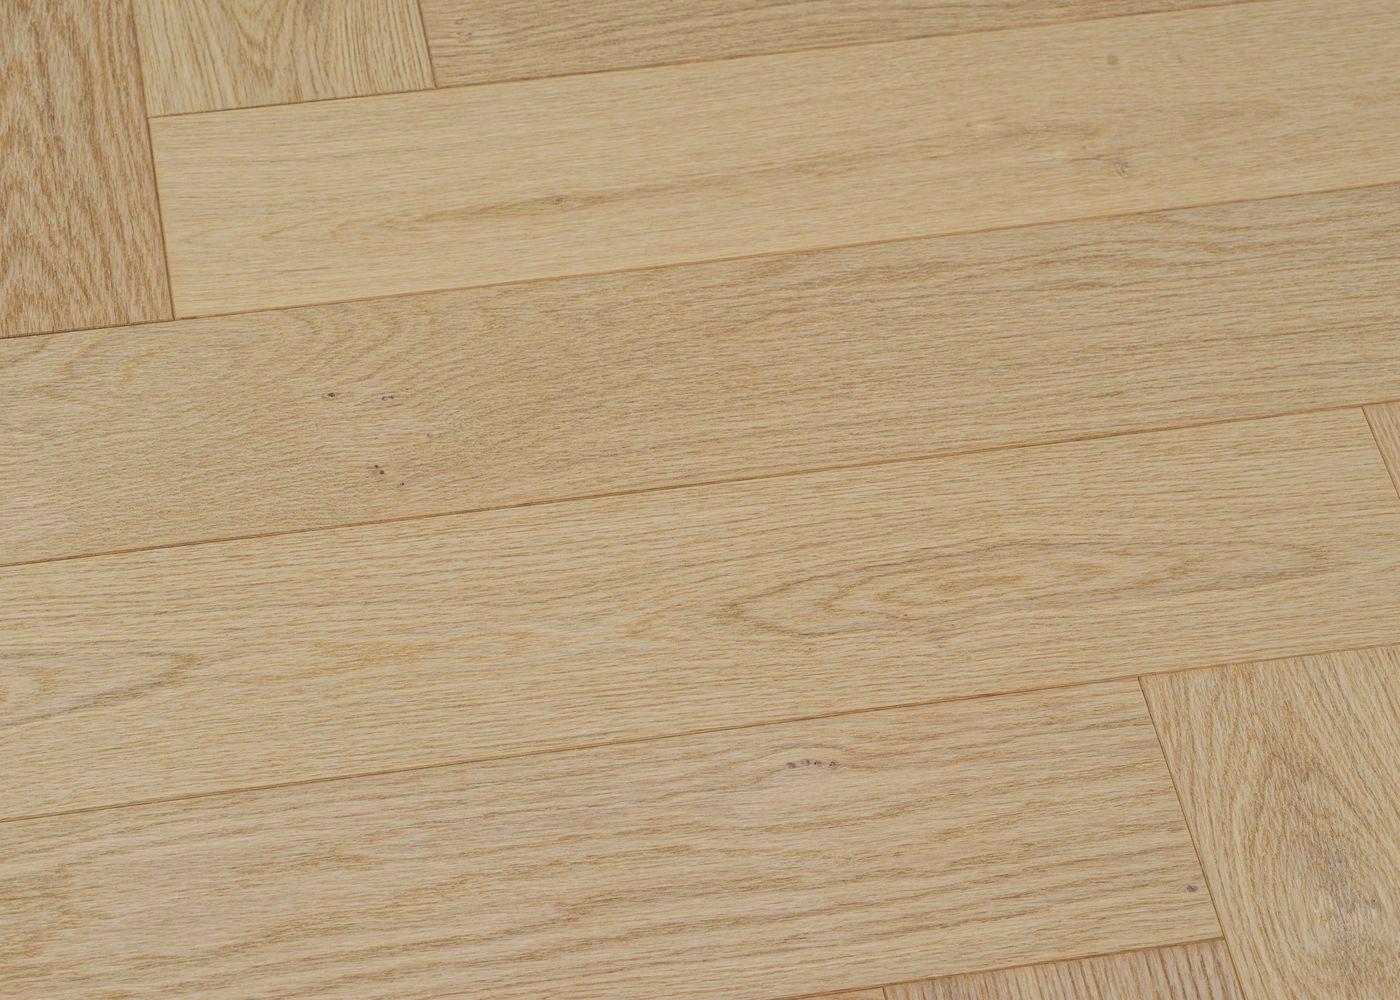 Parquet chêne contrecollé BRUT Bâton Rompu Select support HDF 10x92x610